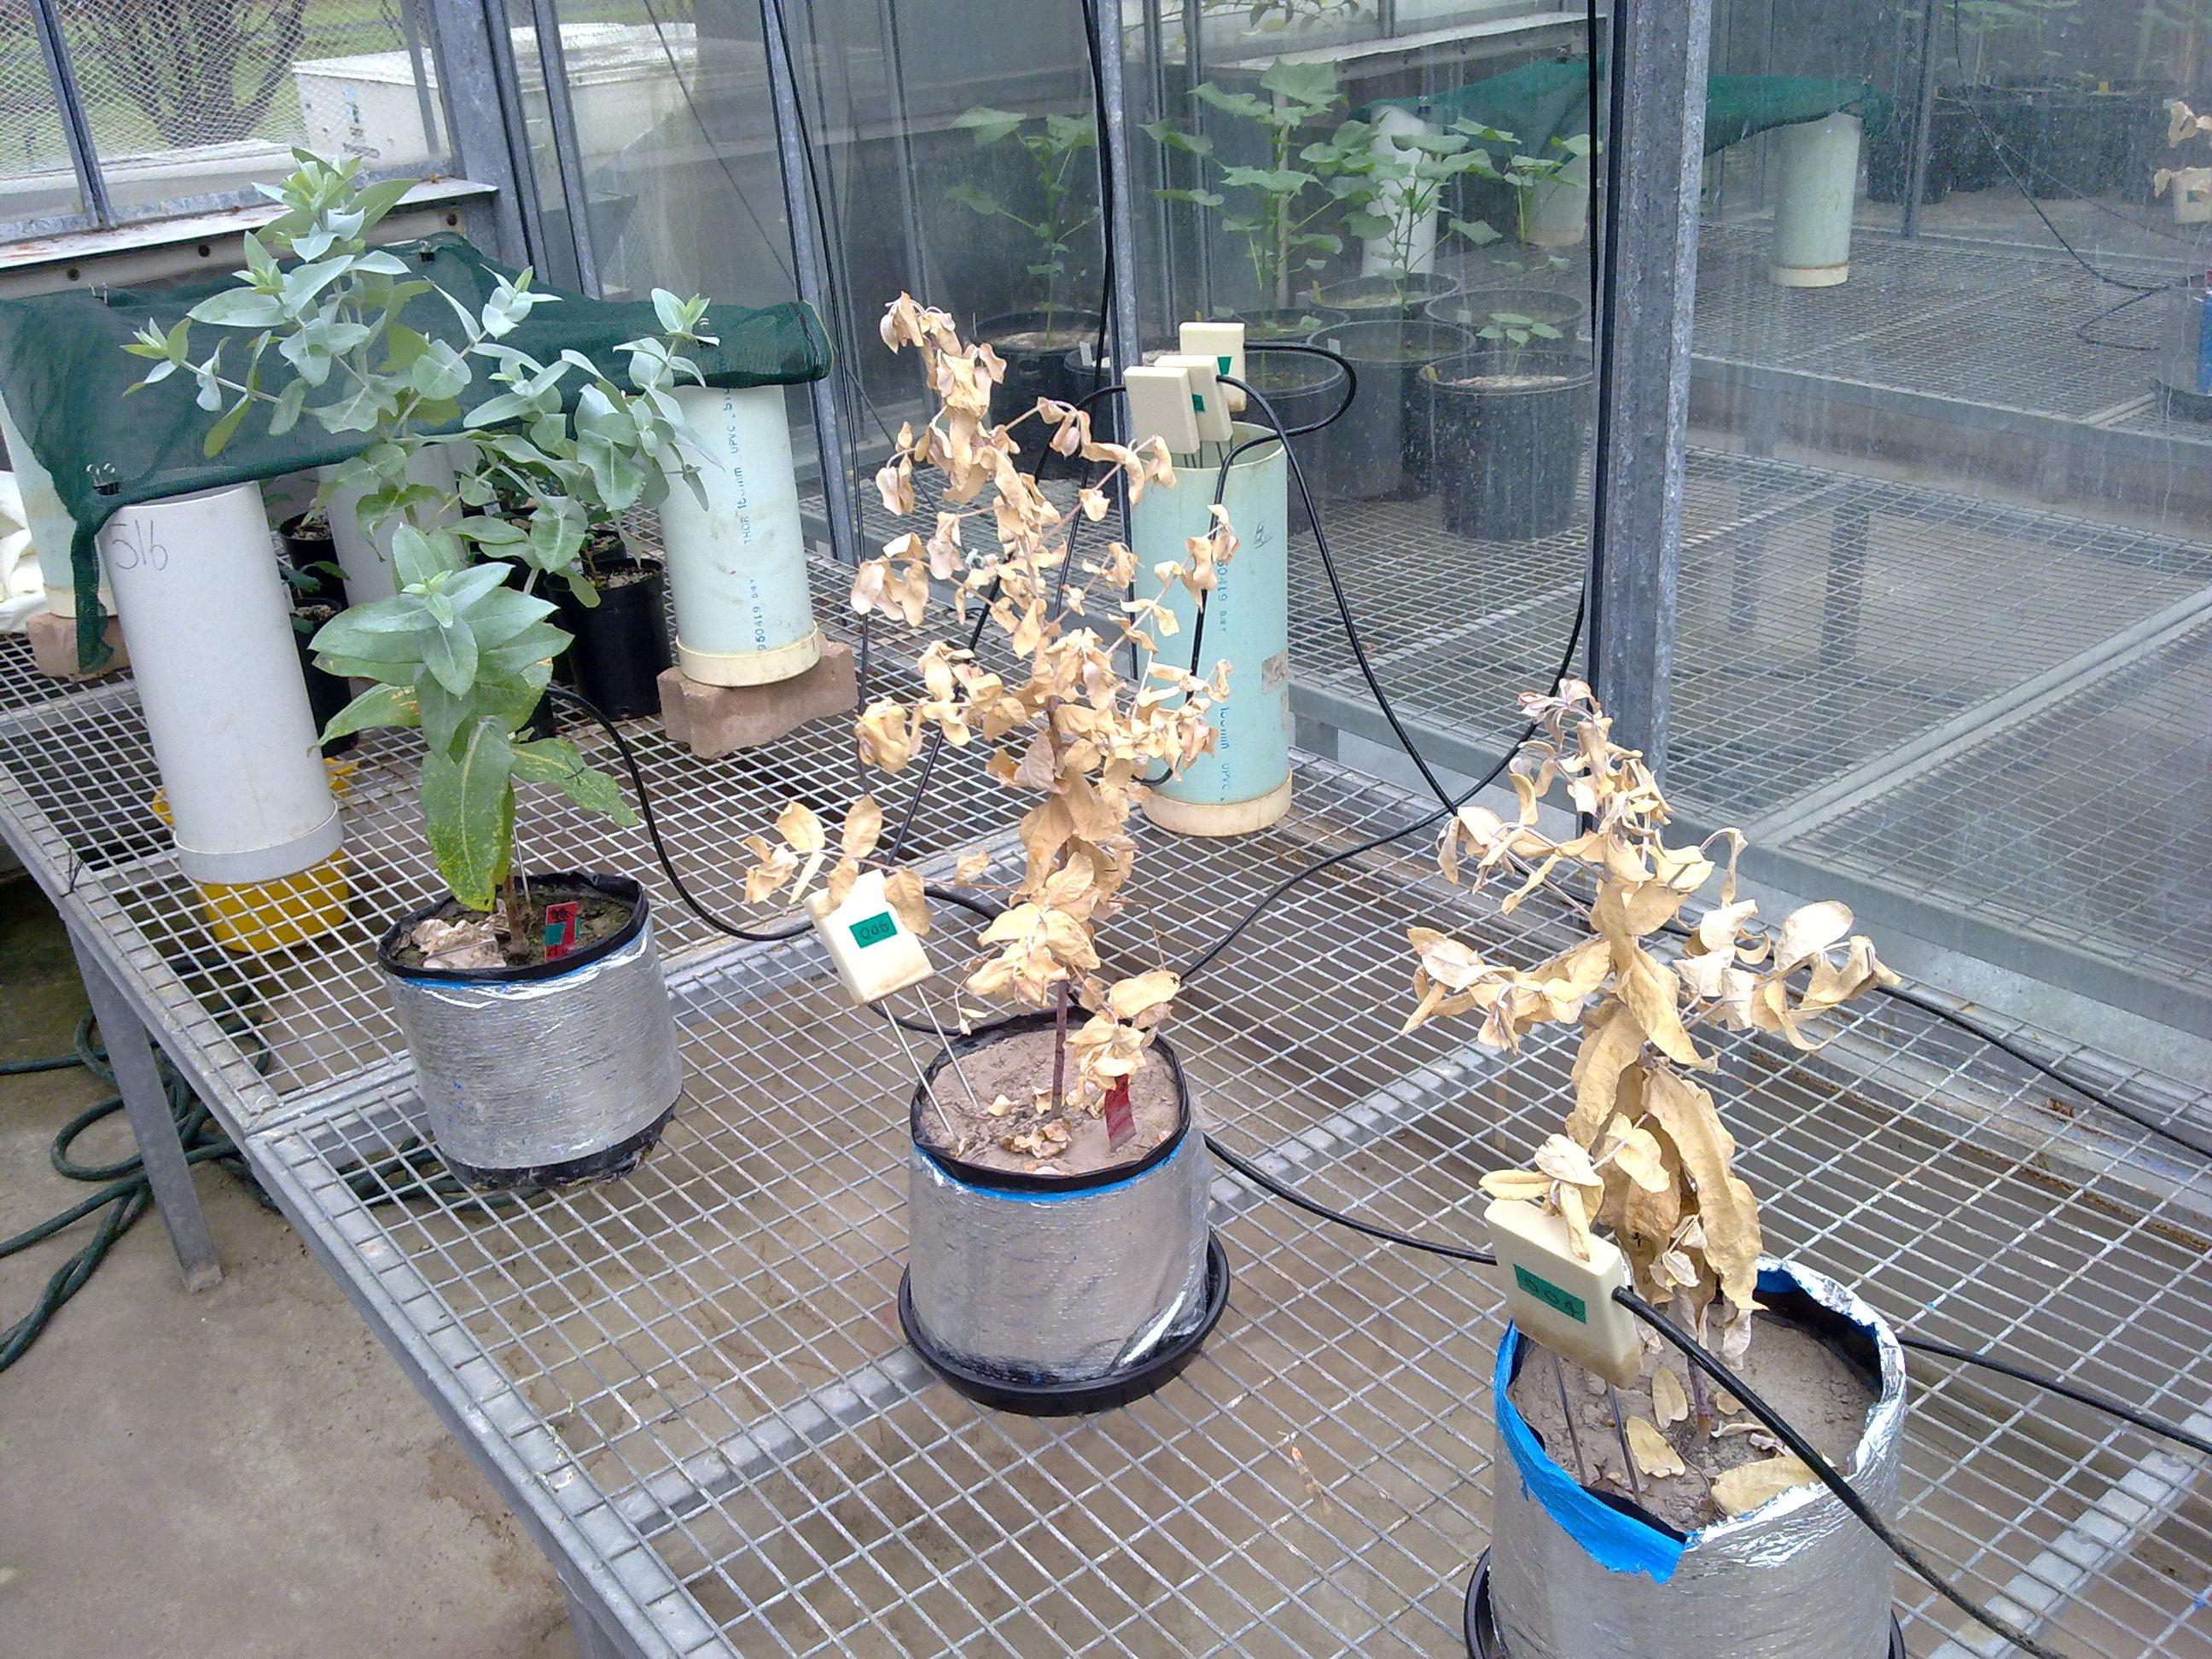 Project - What Kills Plants